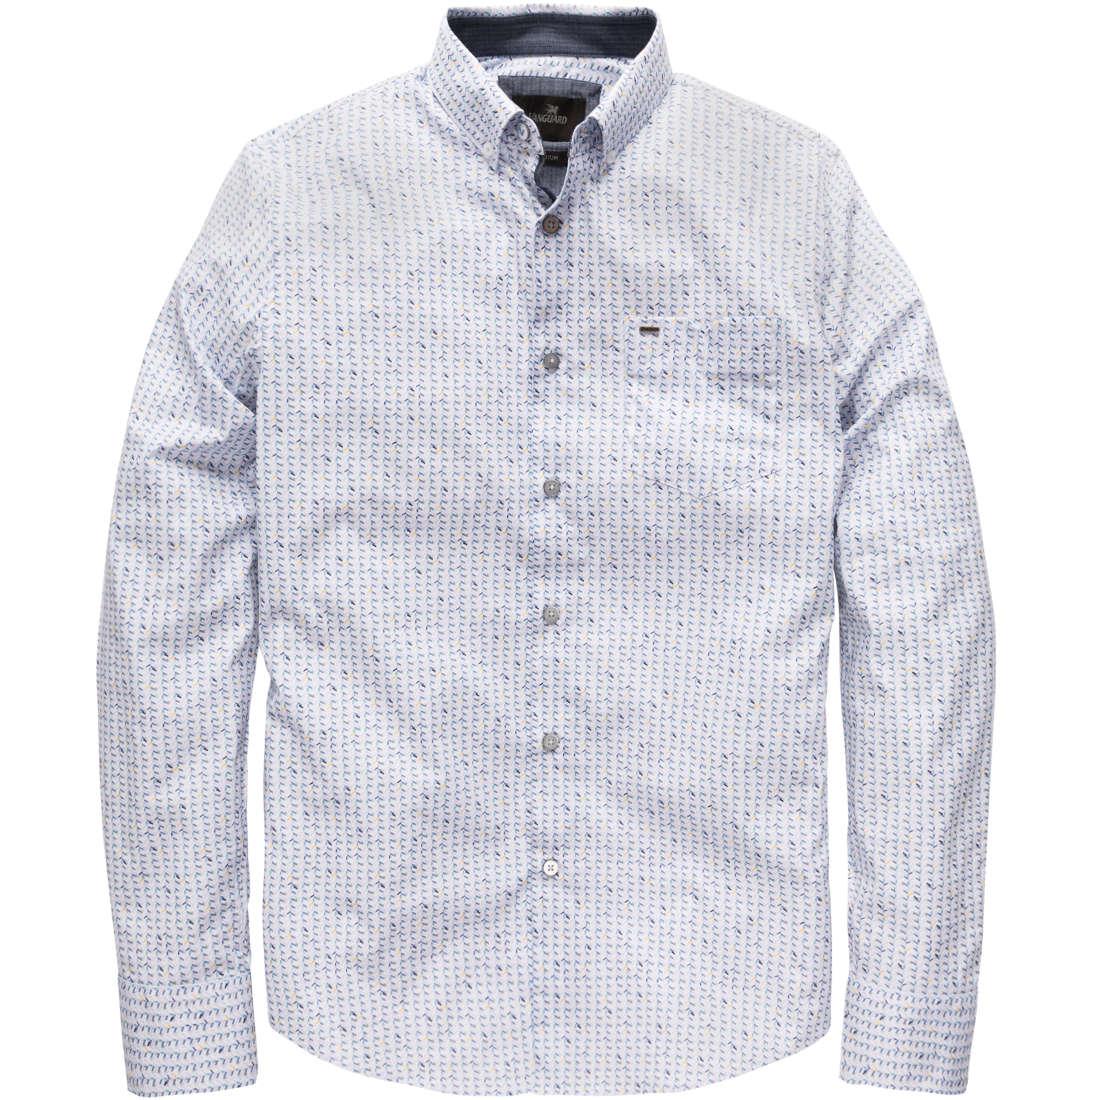 dd9c568ec1e Vanguard overhemd vsi191400 in het Wit